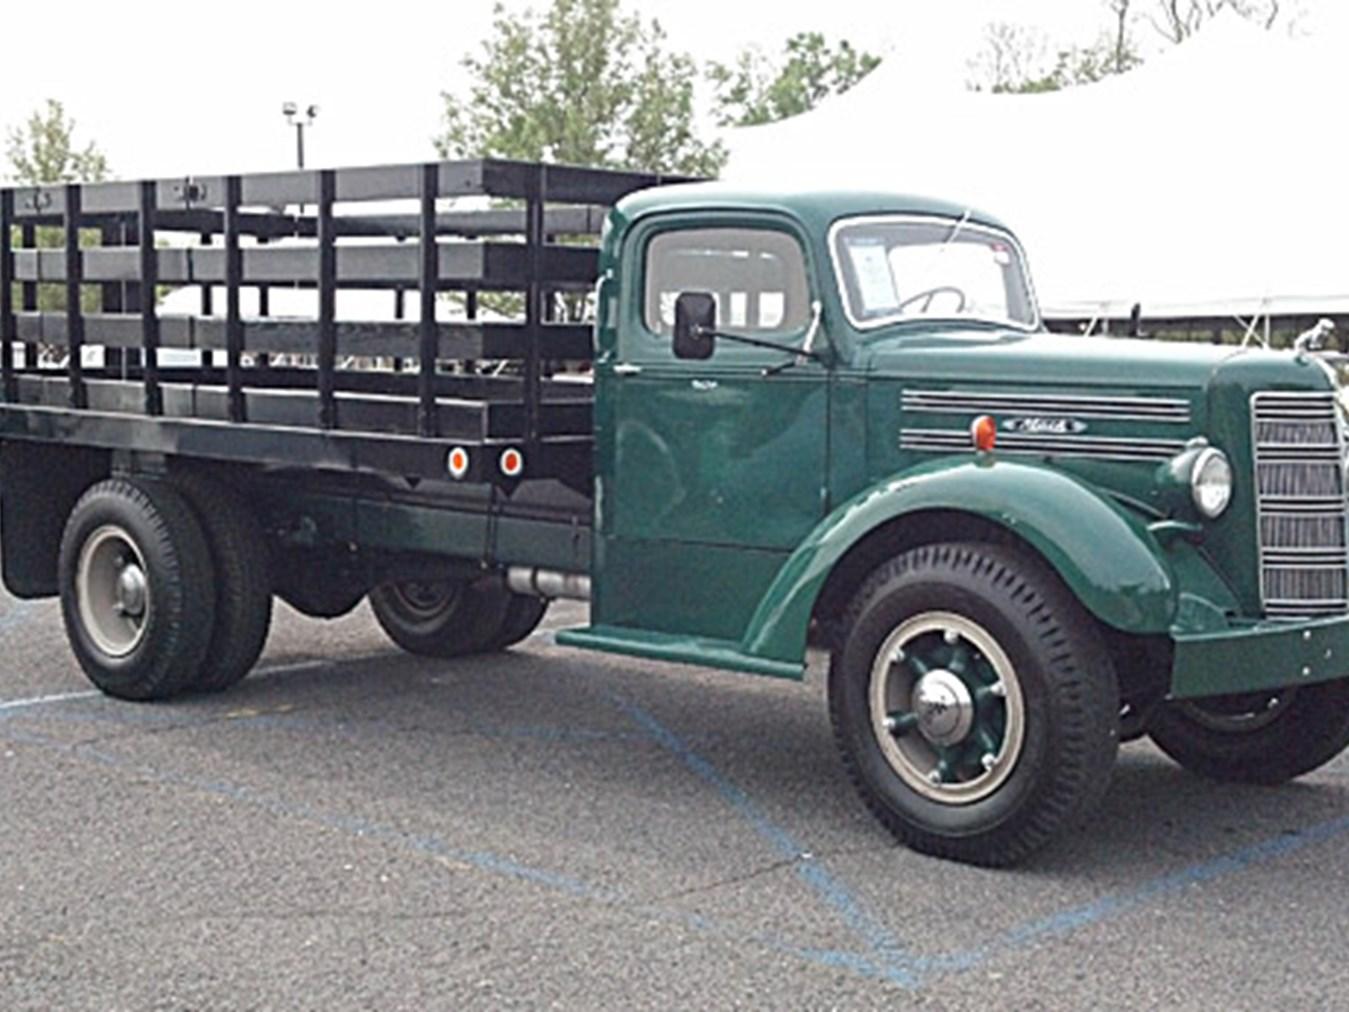 1950 To 1965 Mack Trucks : Rm sotheby s mack truck stake body spring